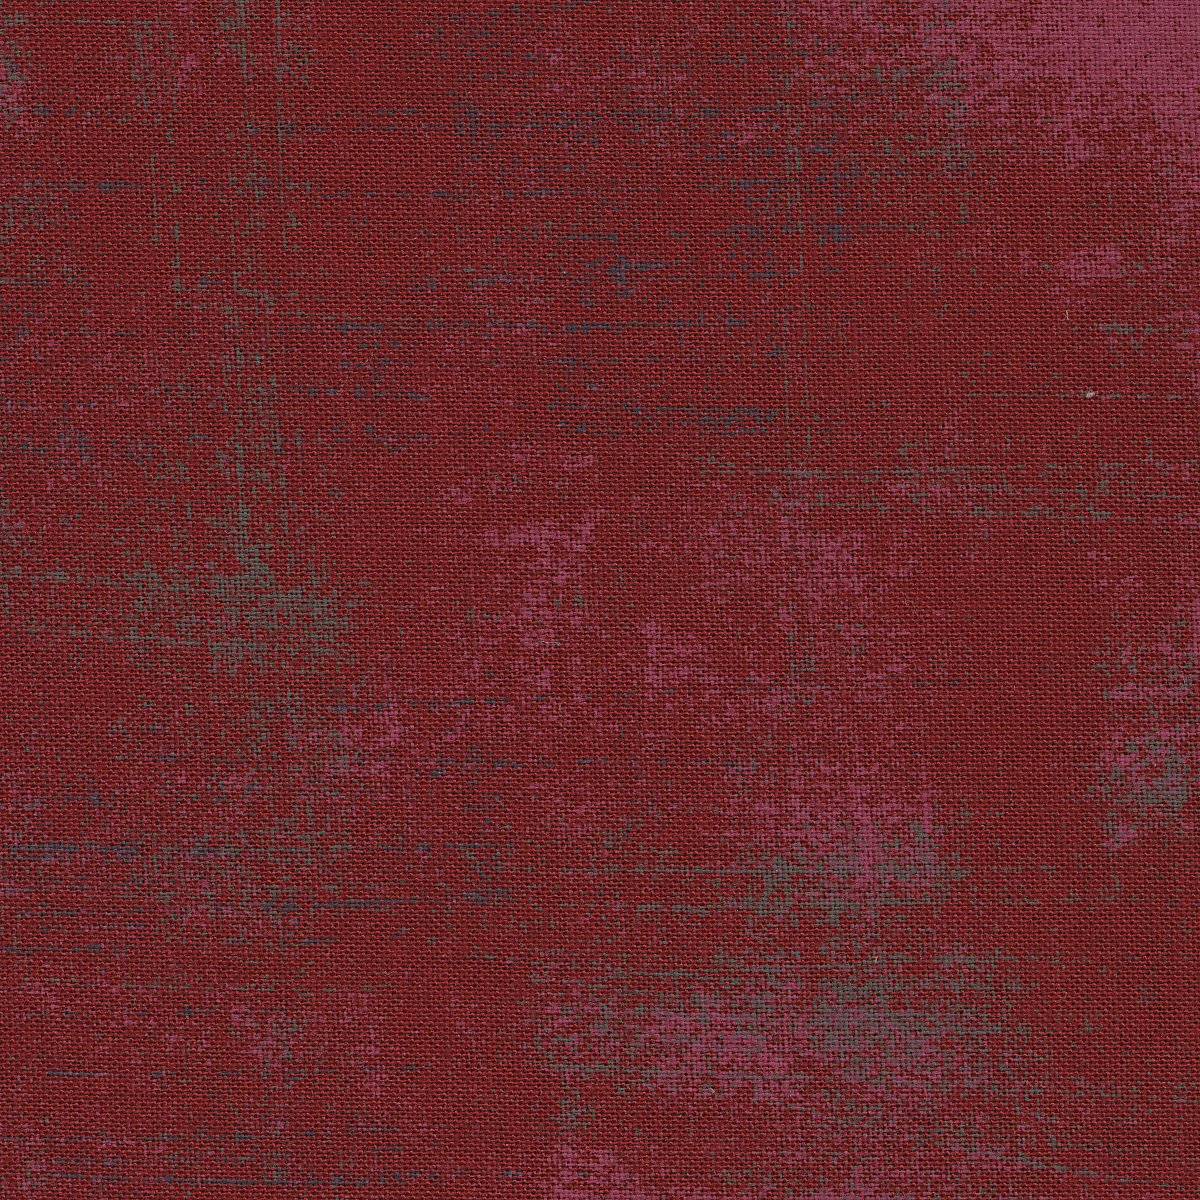 Grunge Basics - Wild Ginger - 530150-502